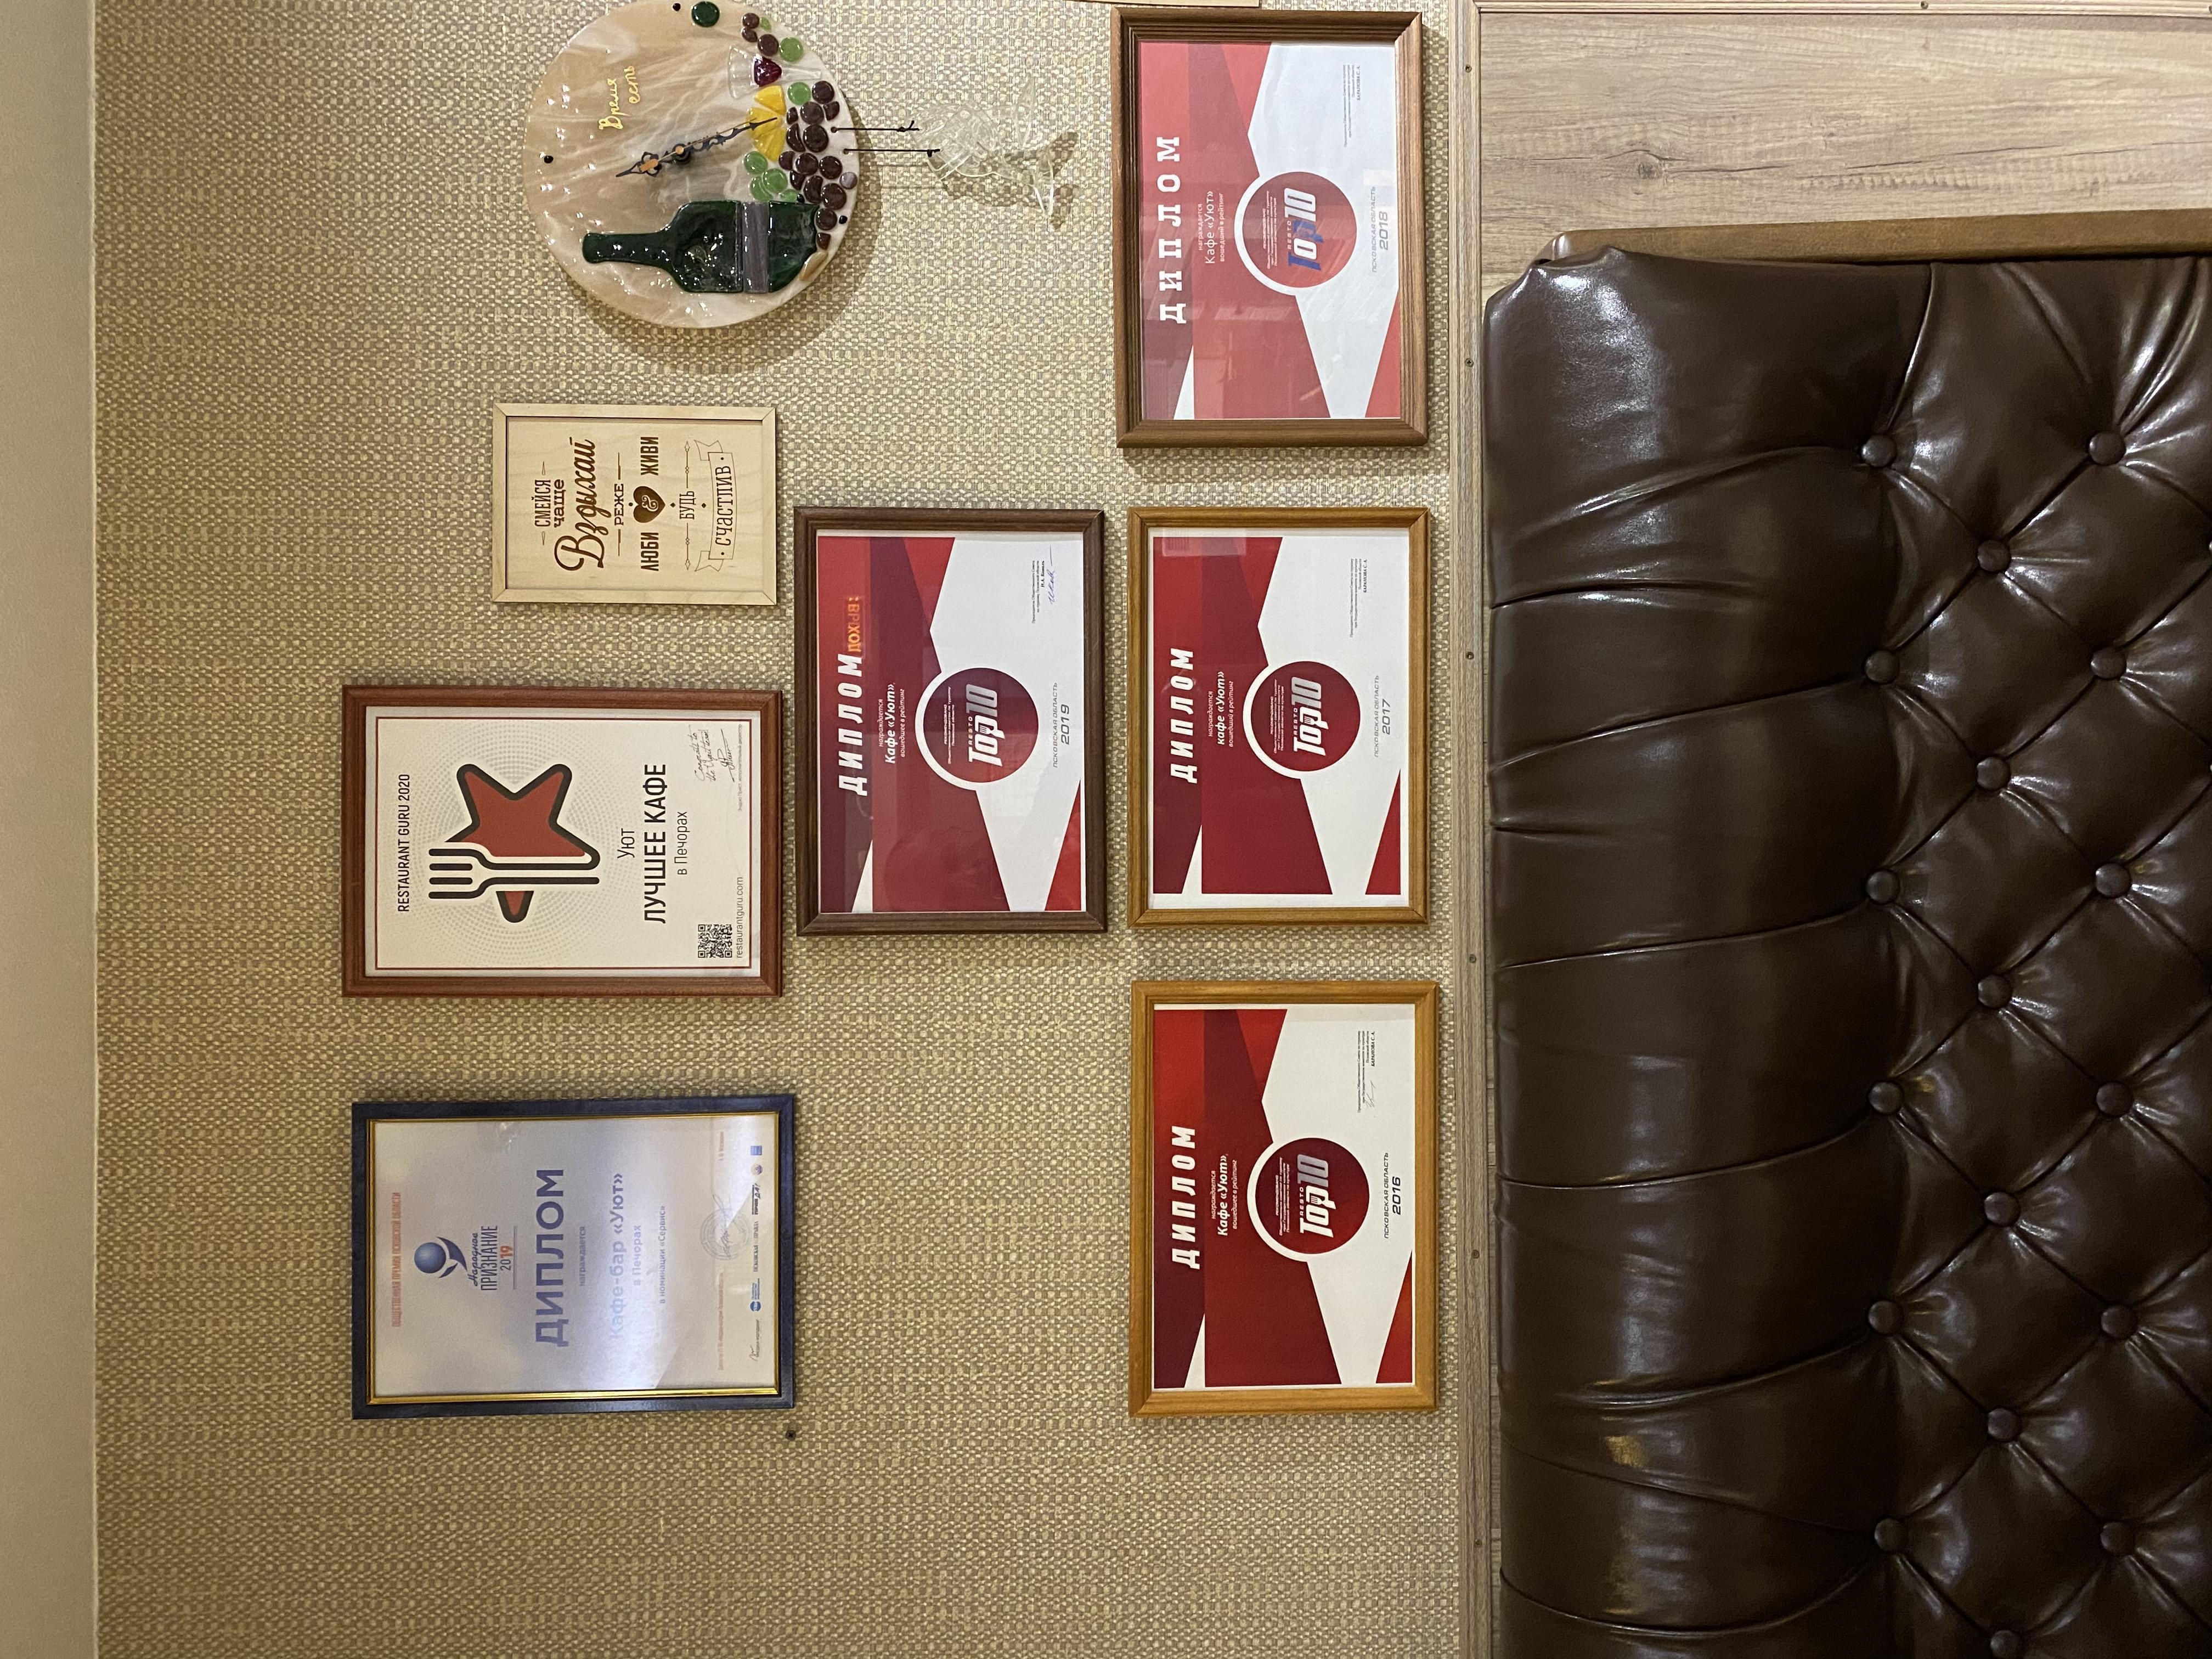 Uyut award